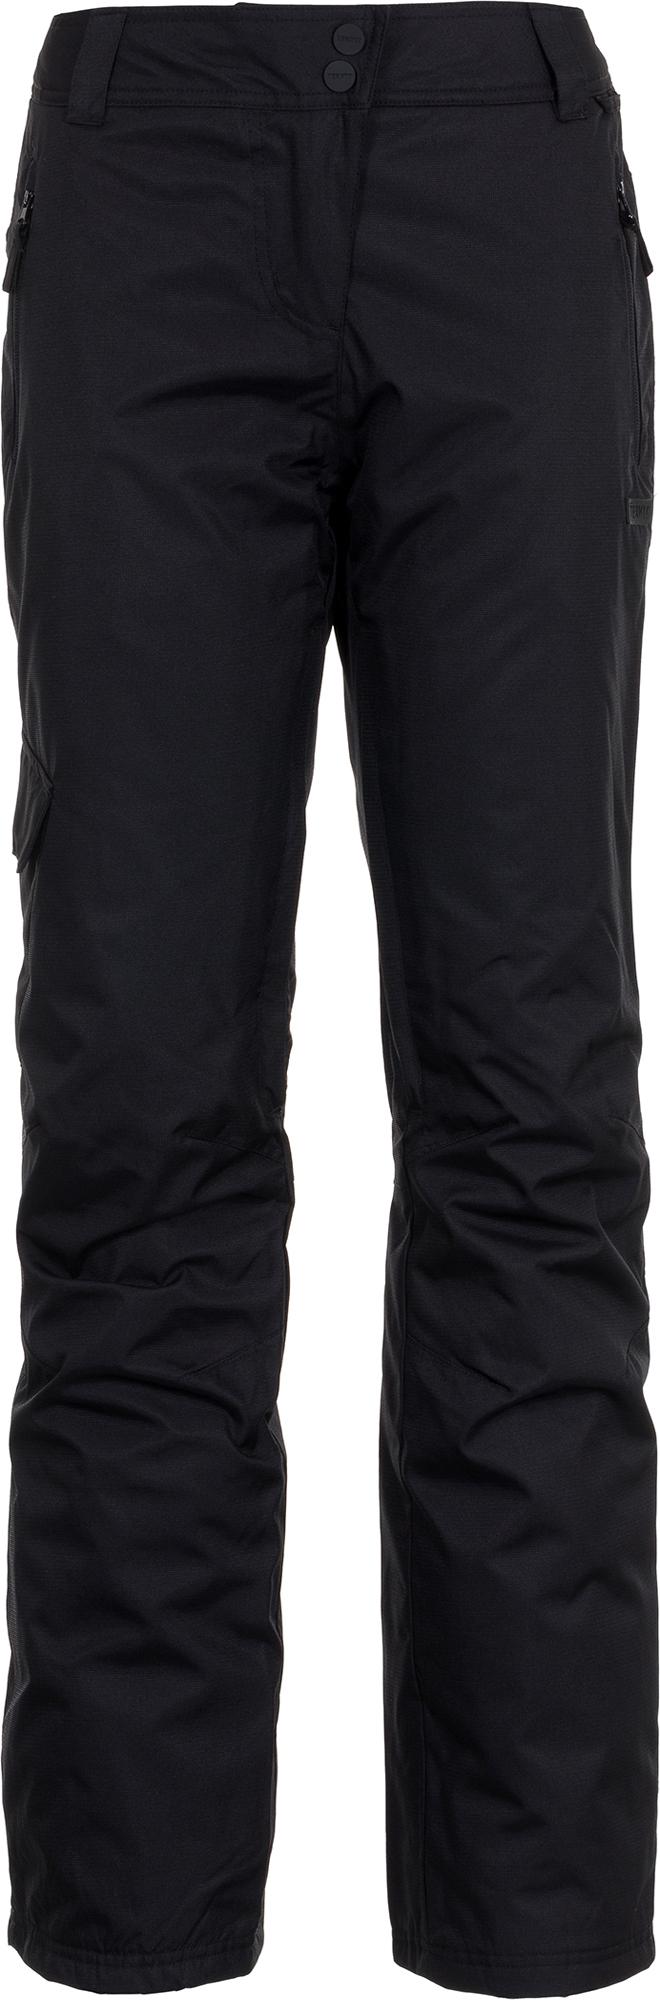 Termit Брюки утепленные женские Termit, размер 50 брюки утепленные женские icepeak цвет темно синий 854020542iv 390 размер 34 40